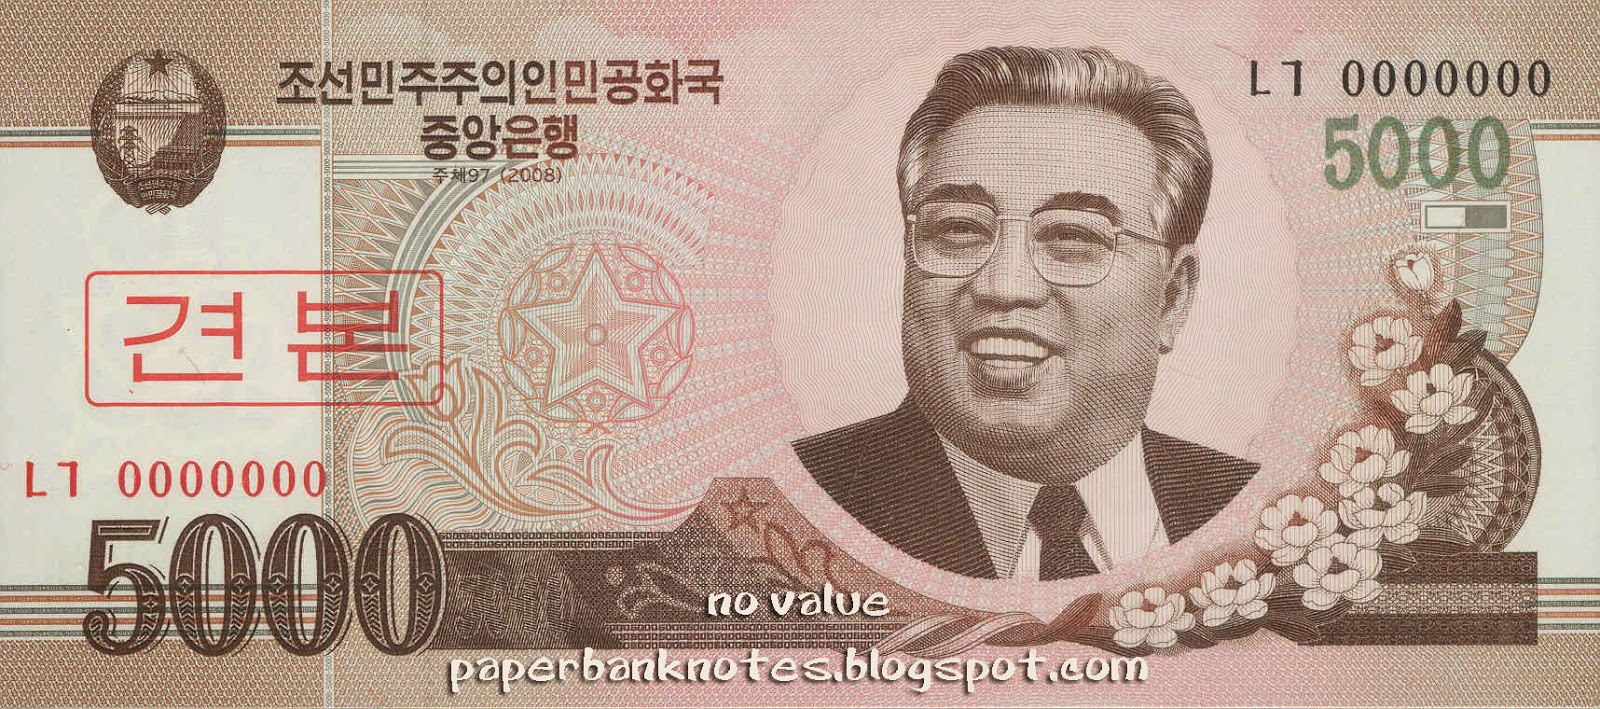 http://eastasiabanknotes.blogspot.com/2014/06/north-korea-2009-specimen.html